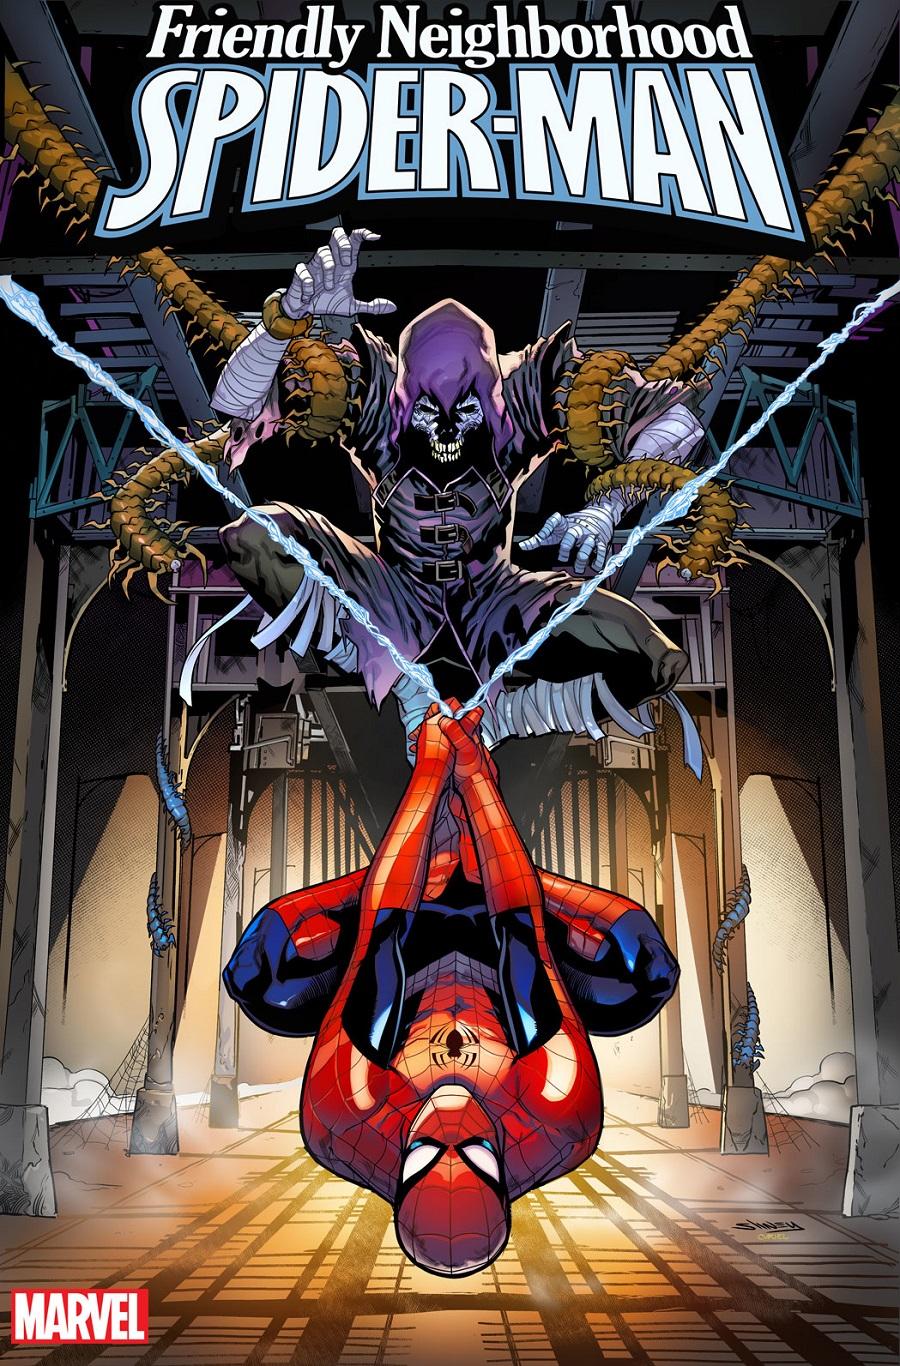 Previews: June 26th, 2019 - Spider Man Crawlspace